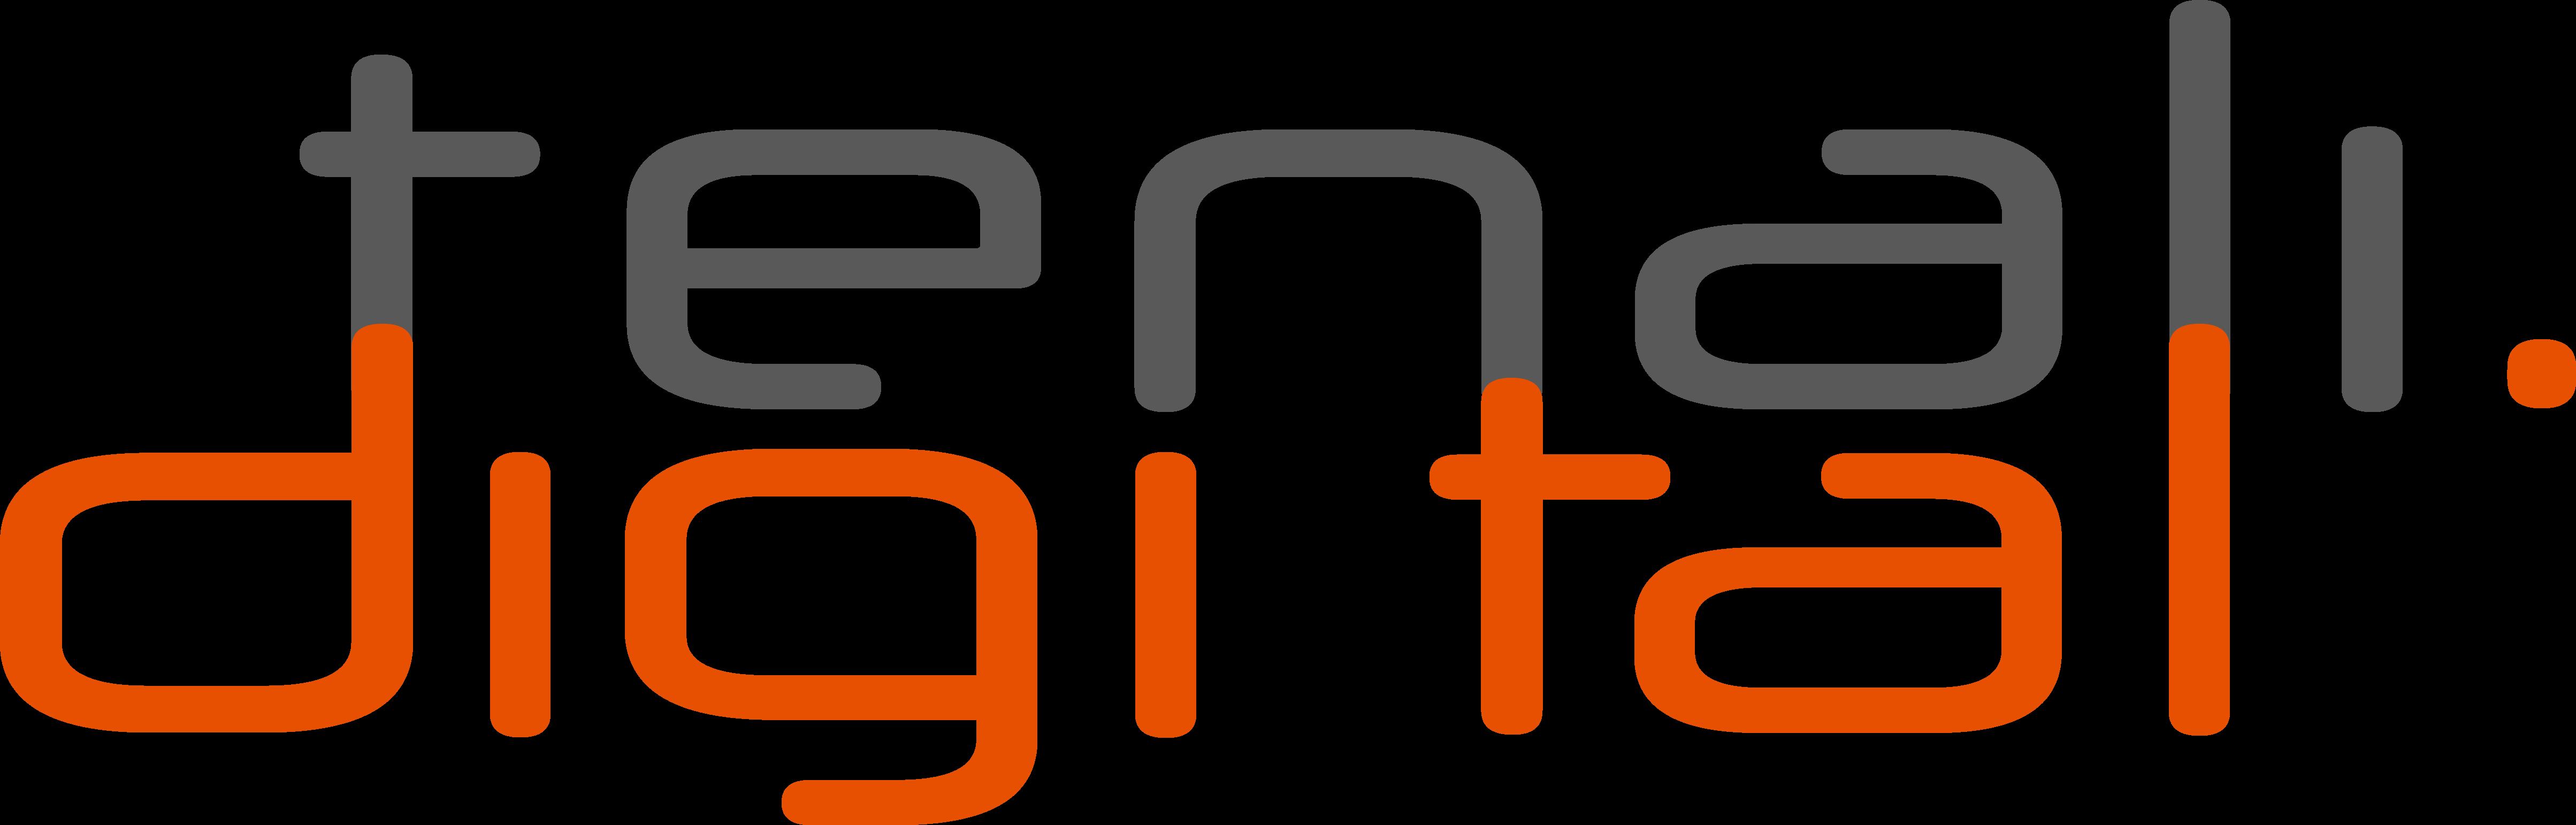 tenali digital partners with Ameyo